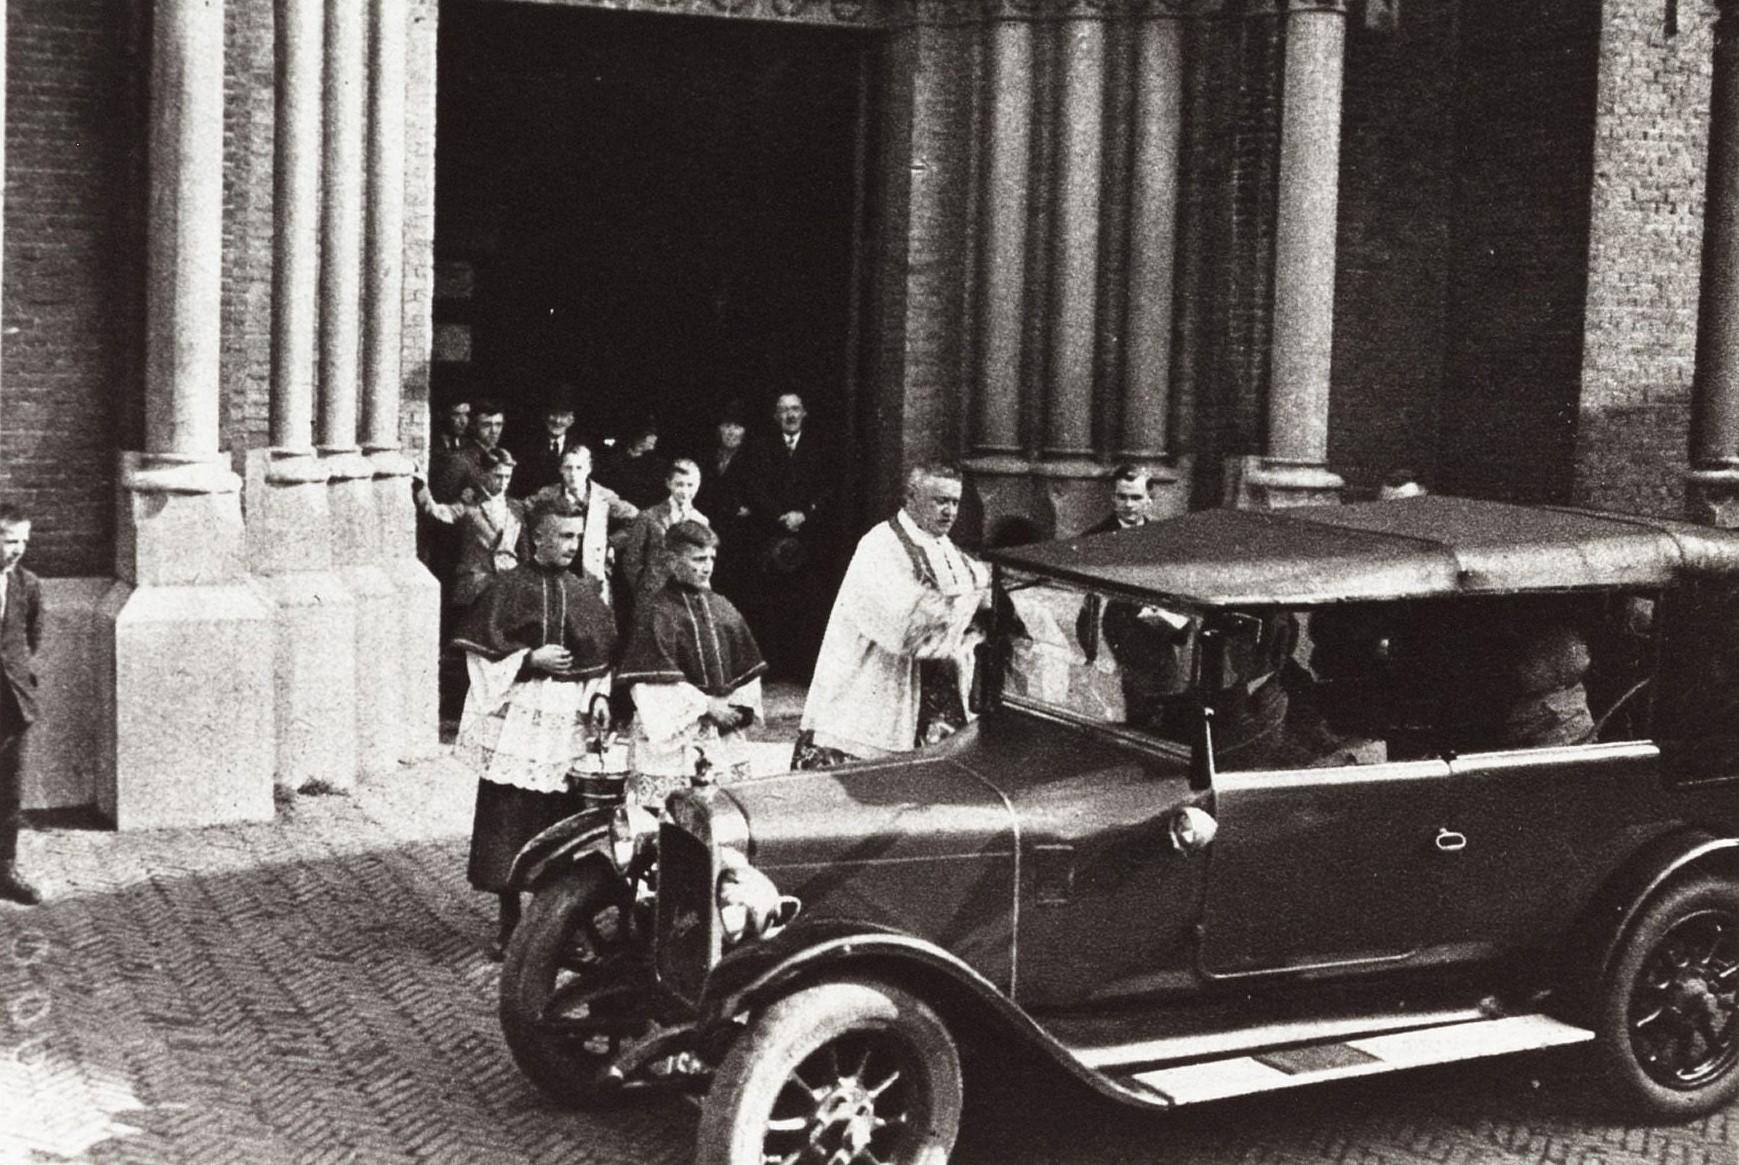 1928-Ford-Broederchap-van-St-Christoffel-autozegening